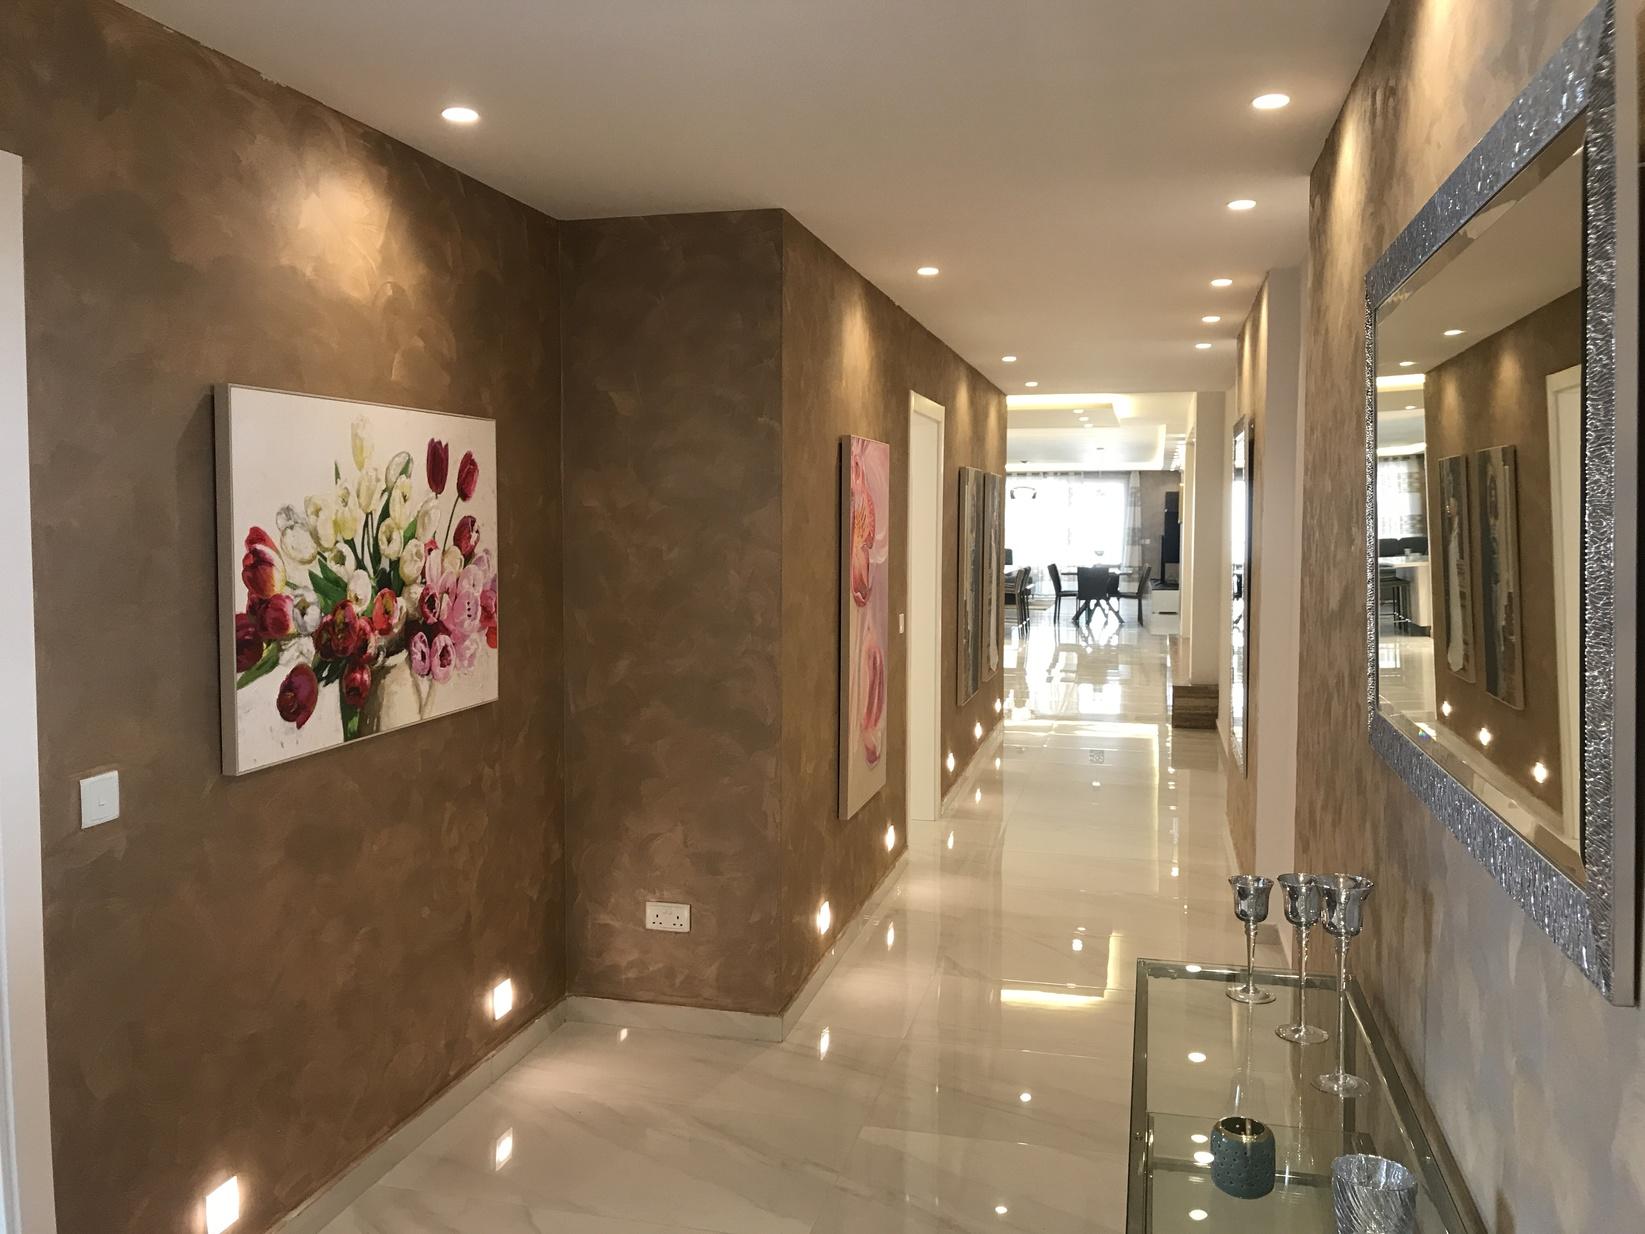 3 bed Apartment For Rent in Qawra, Qawra - thumb 18